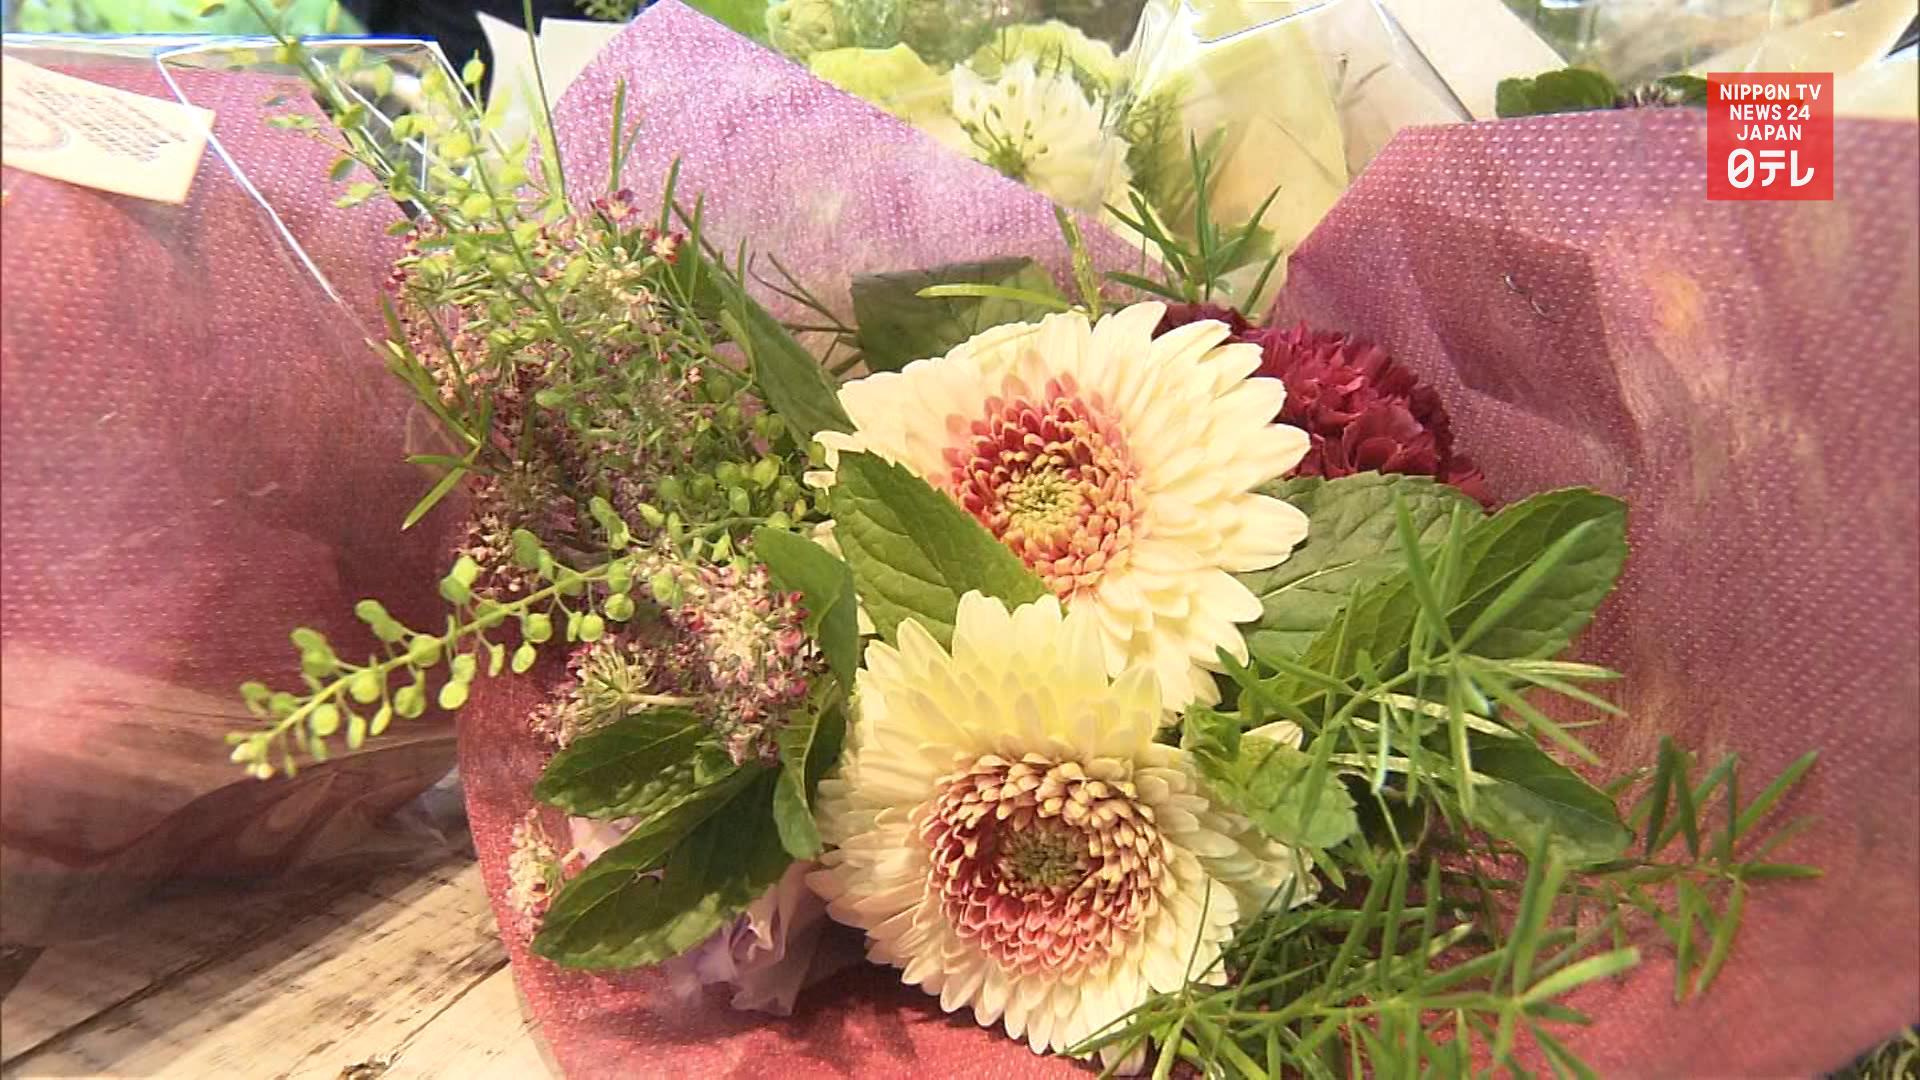 Canceled flowers encourage doctors